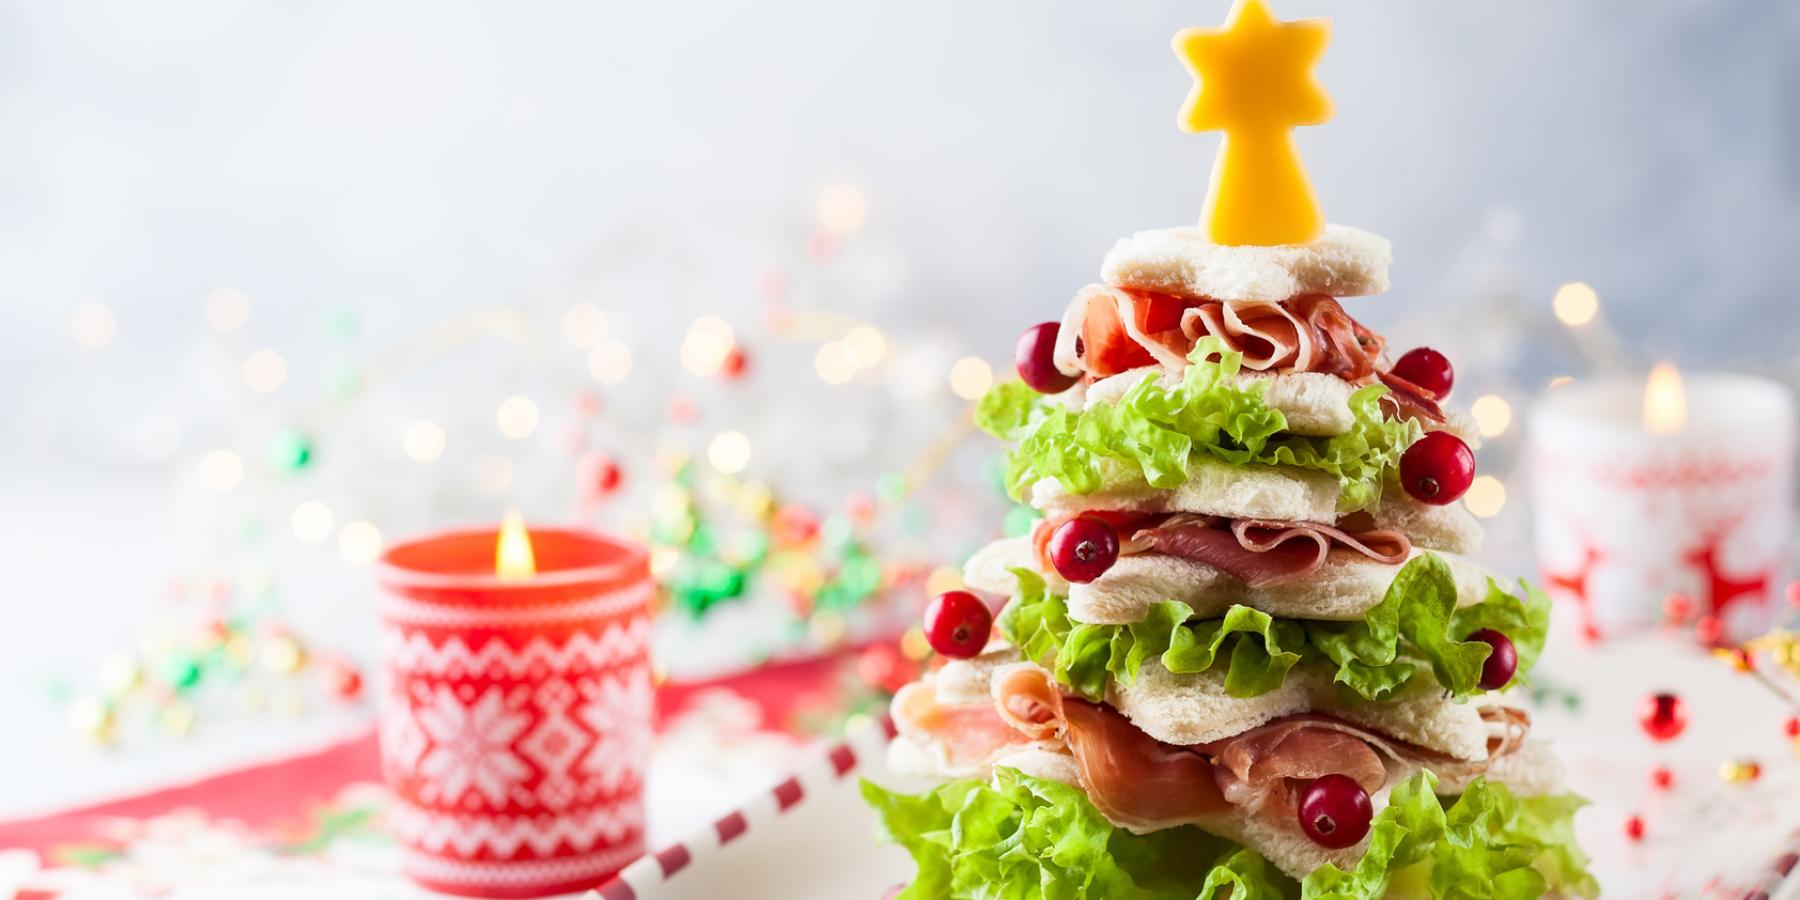 Antipasto Di Natale Umbria.I Salumi Nel Menu Di Natale Menatti Blog